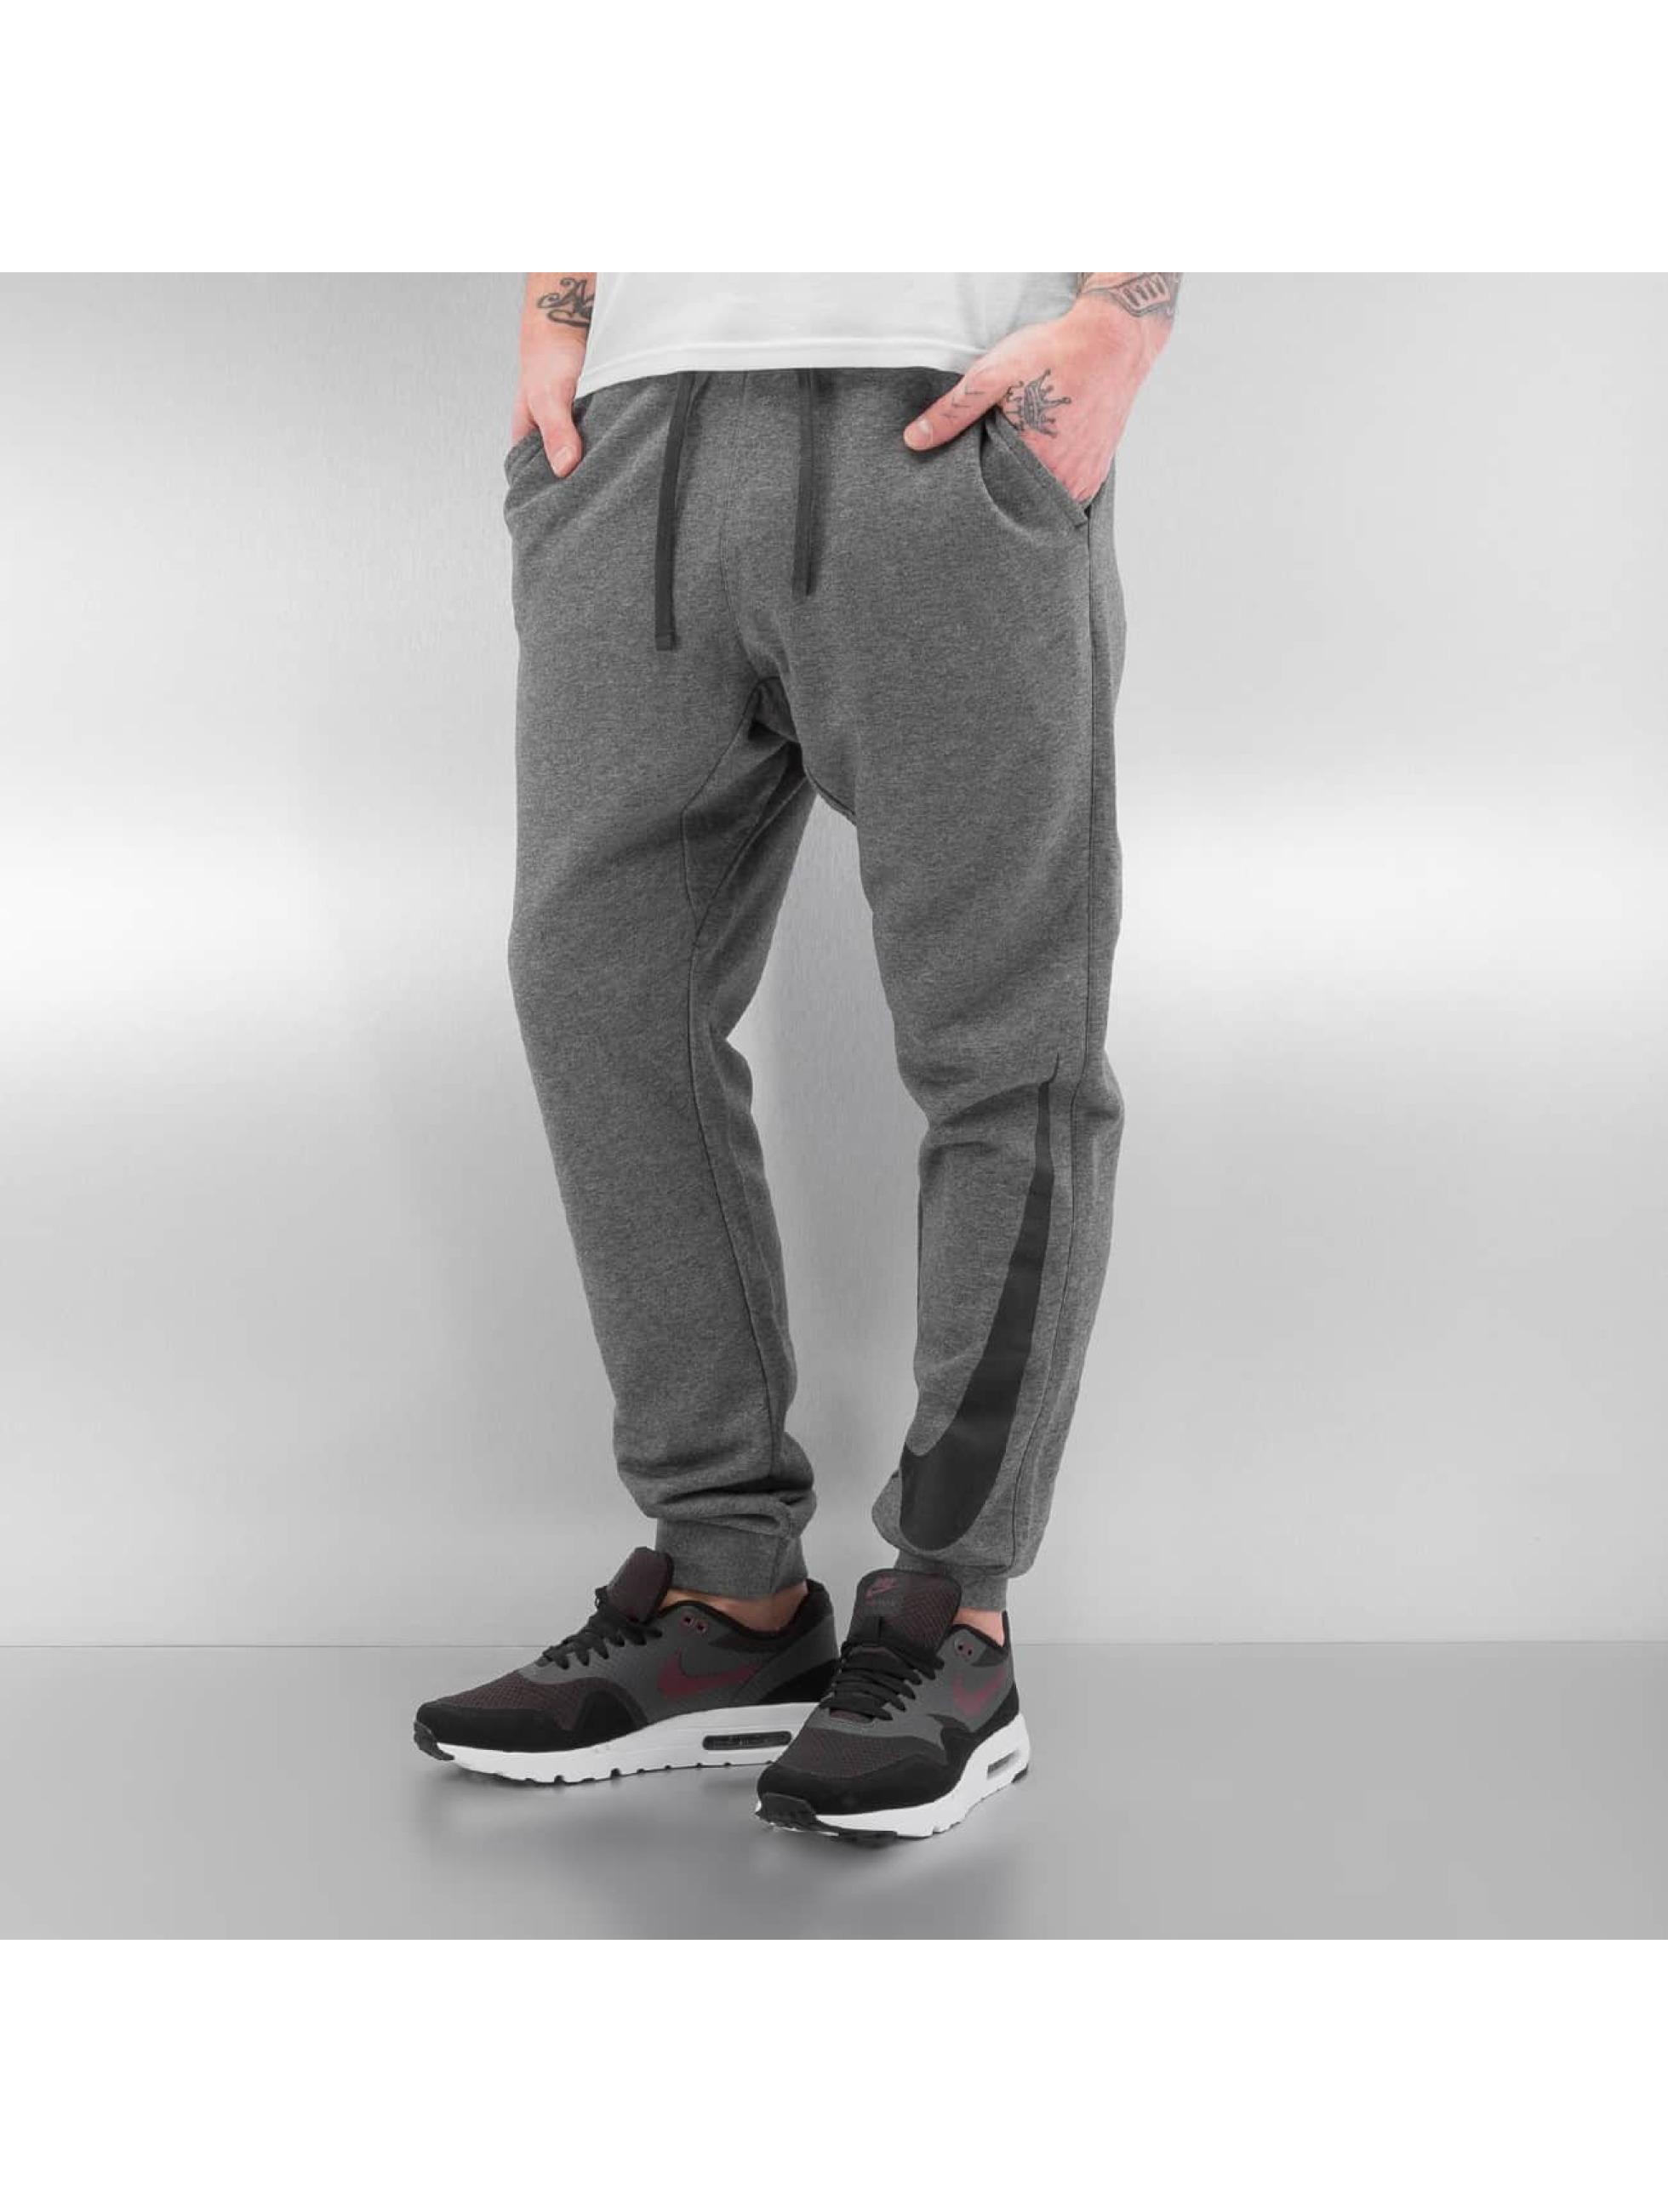 Nike Männer Jogginghose NSW FLC Hybrid in grau Sale Angebote Döbern